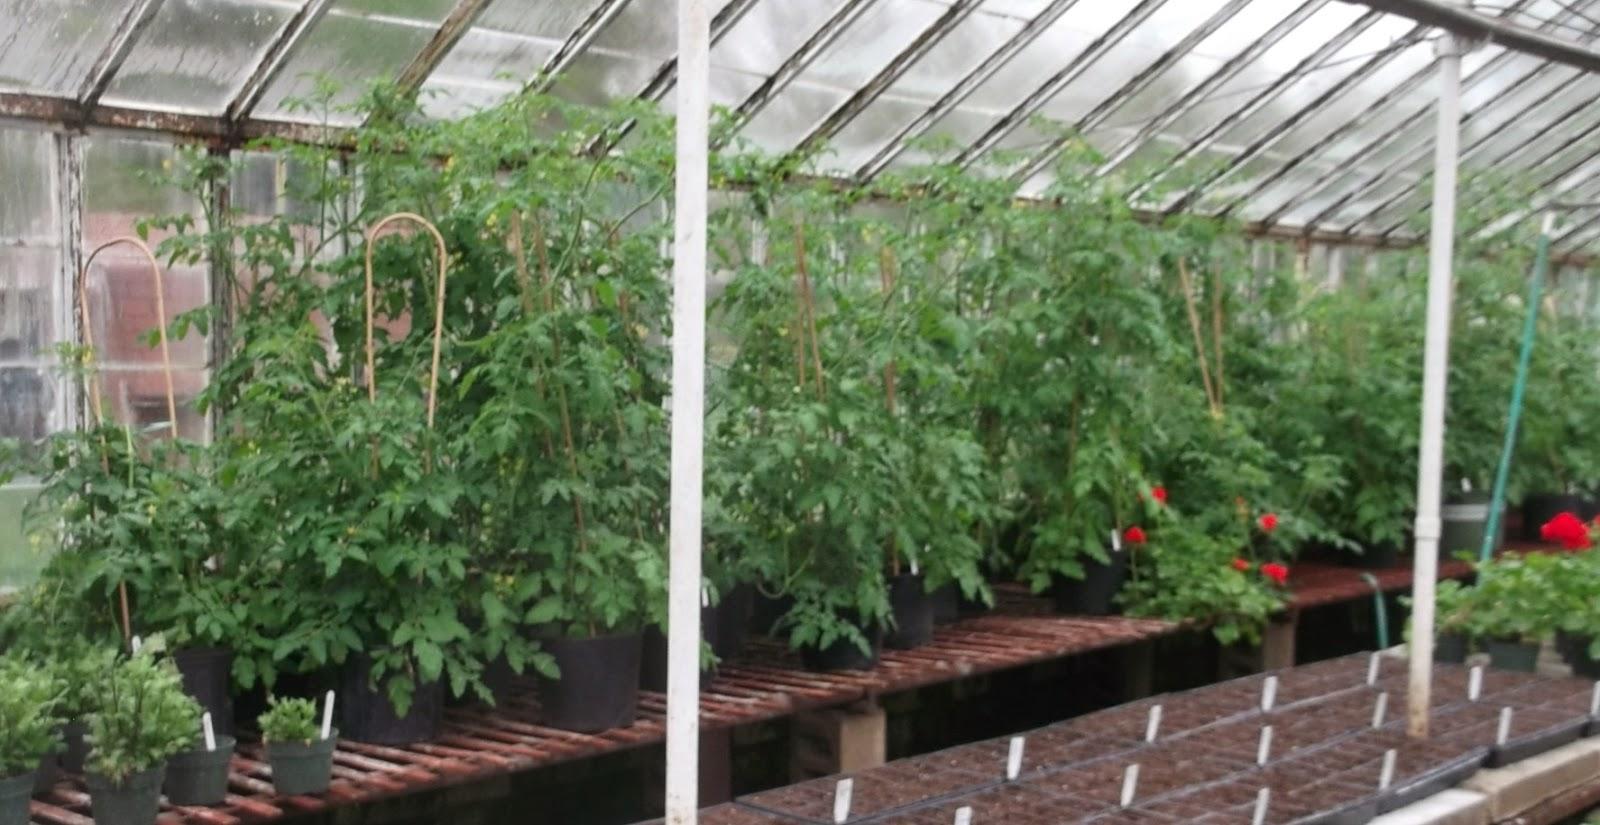 Flower Garden Eaton Rapids Michigan: Eaton Rapids Joe: Hastay's Greenhouse And Flower Shop